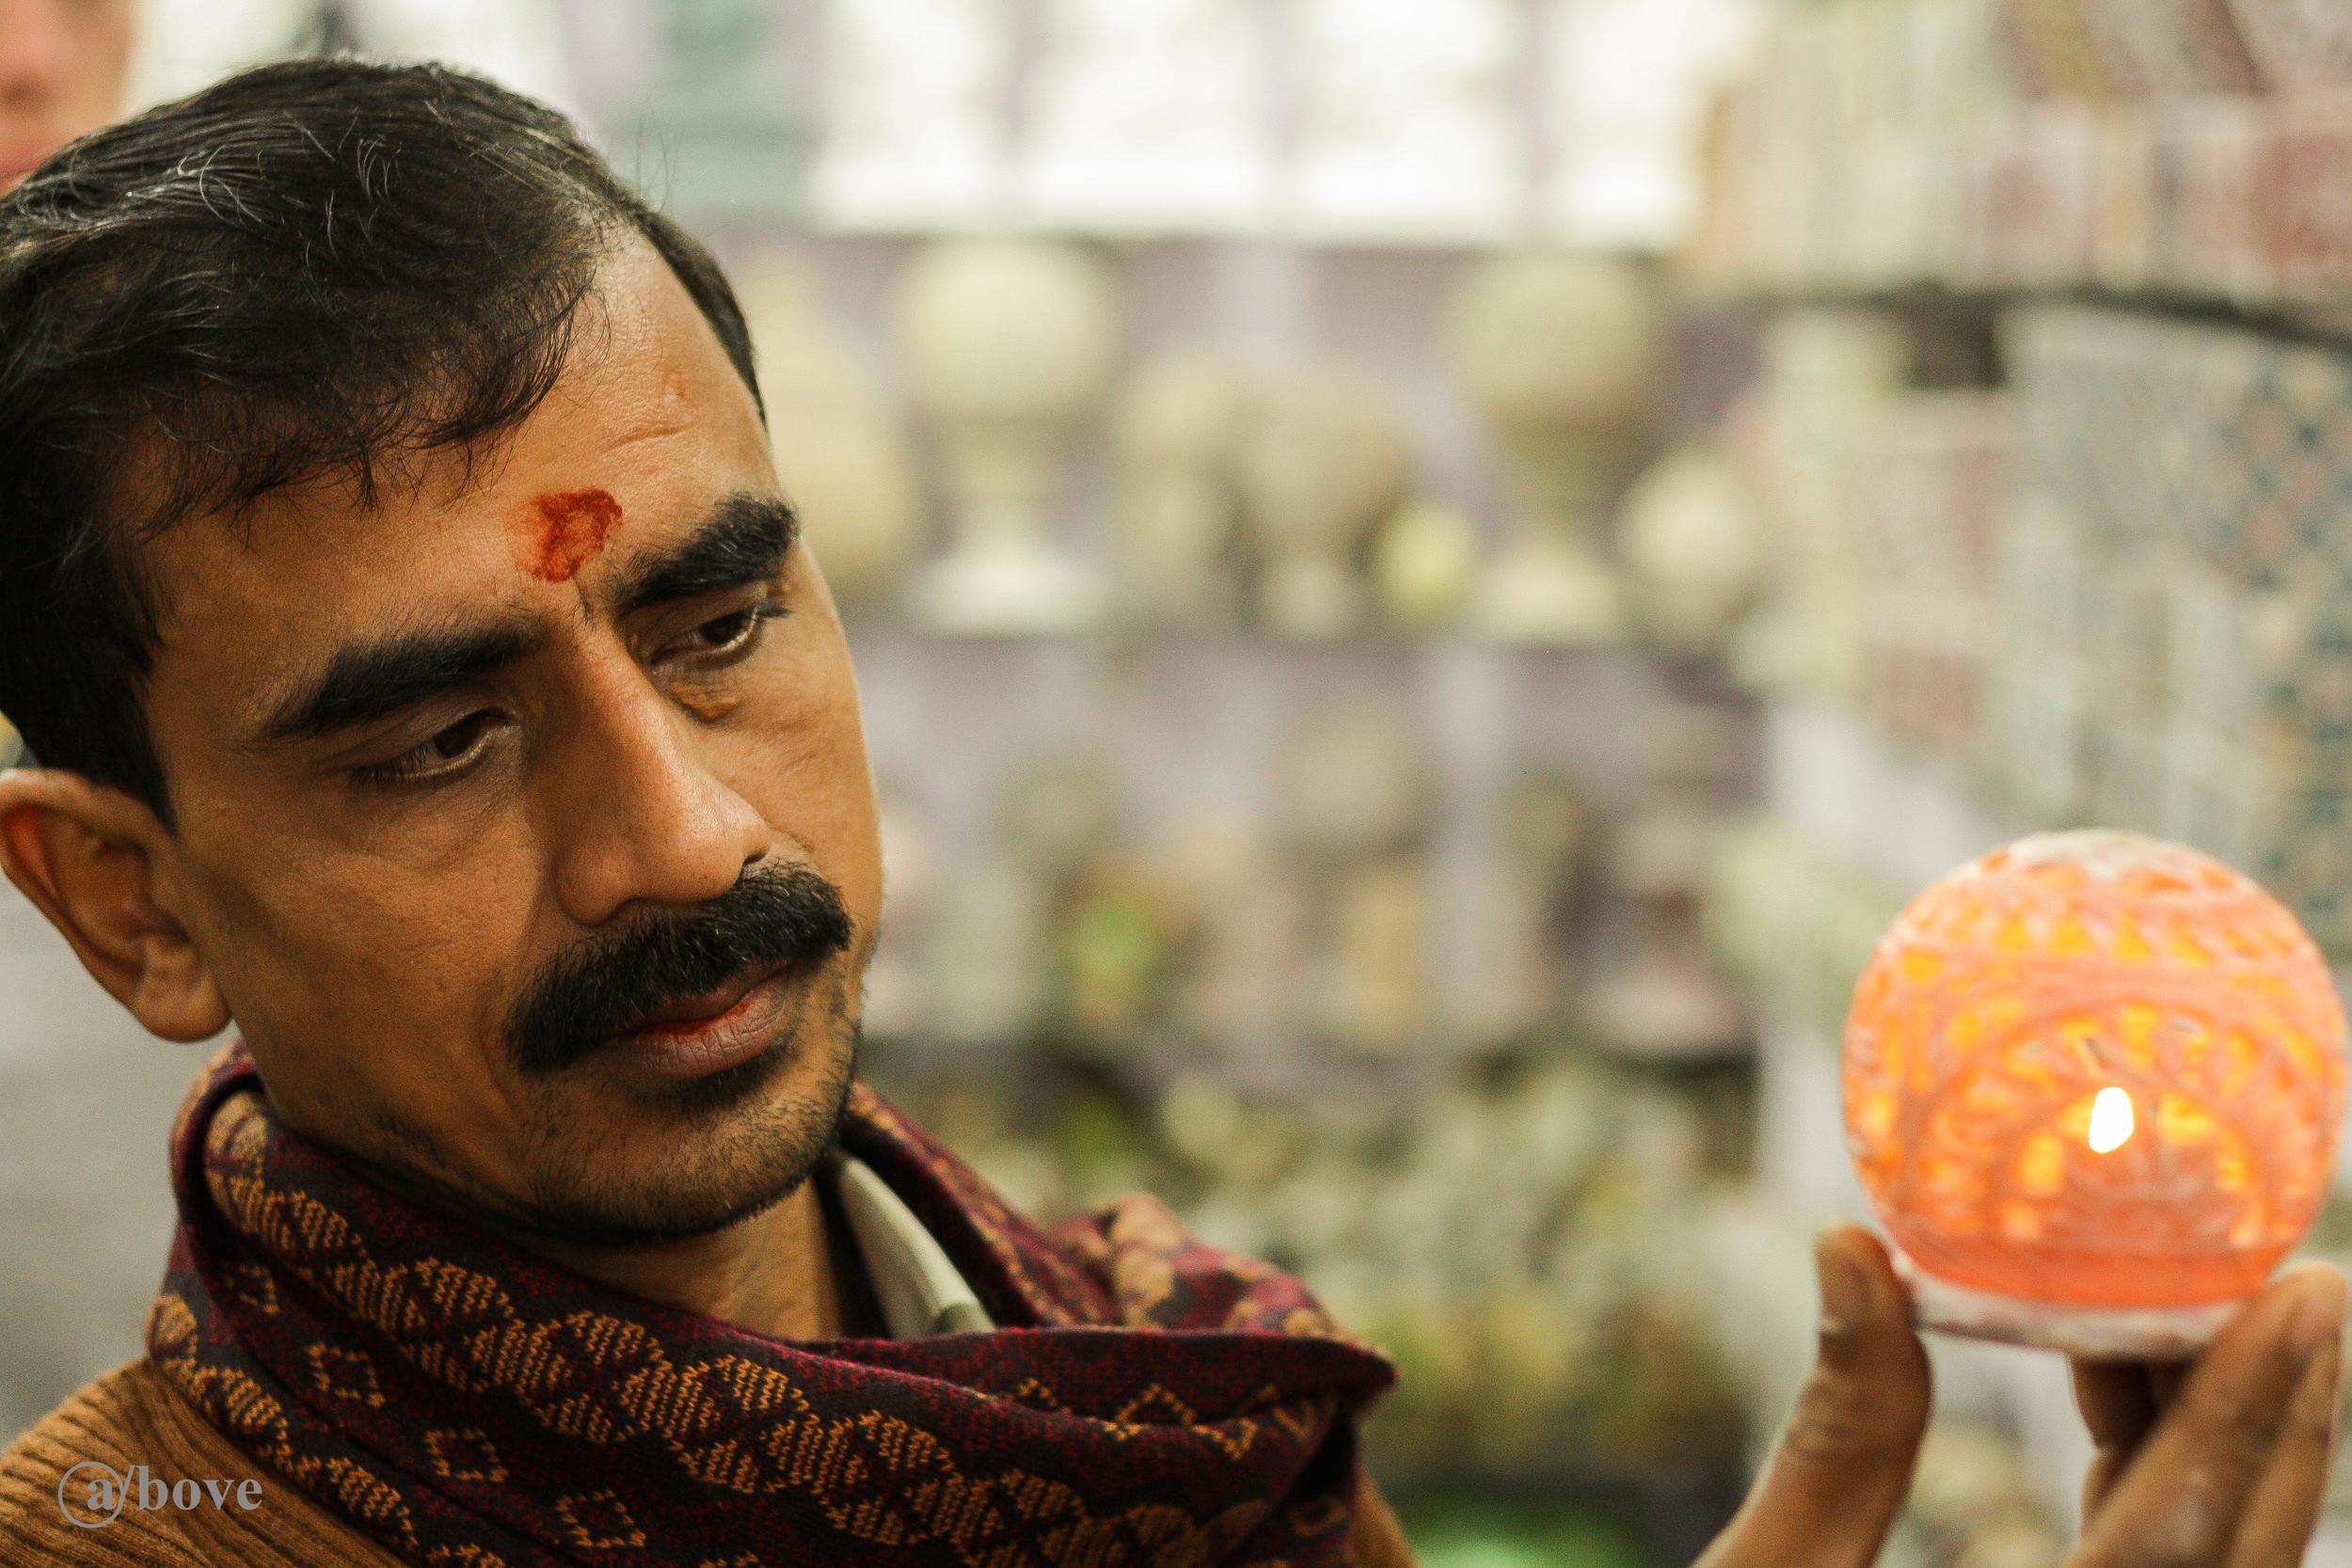 Portraits of India_6.jpg